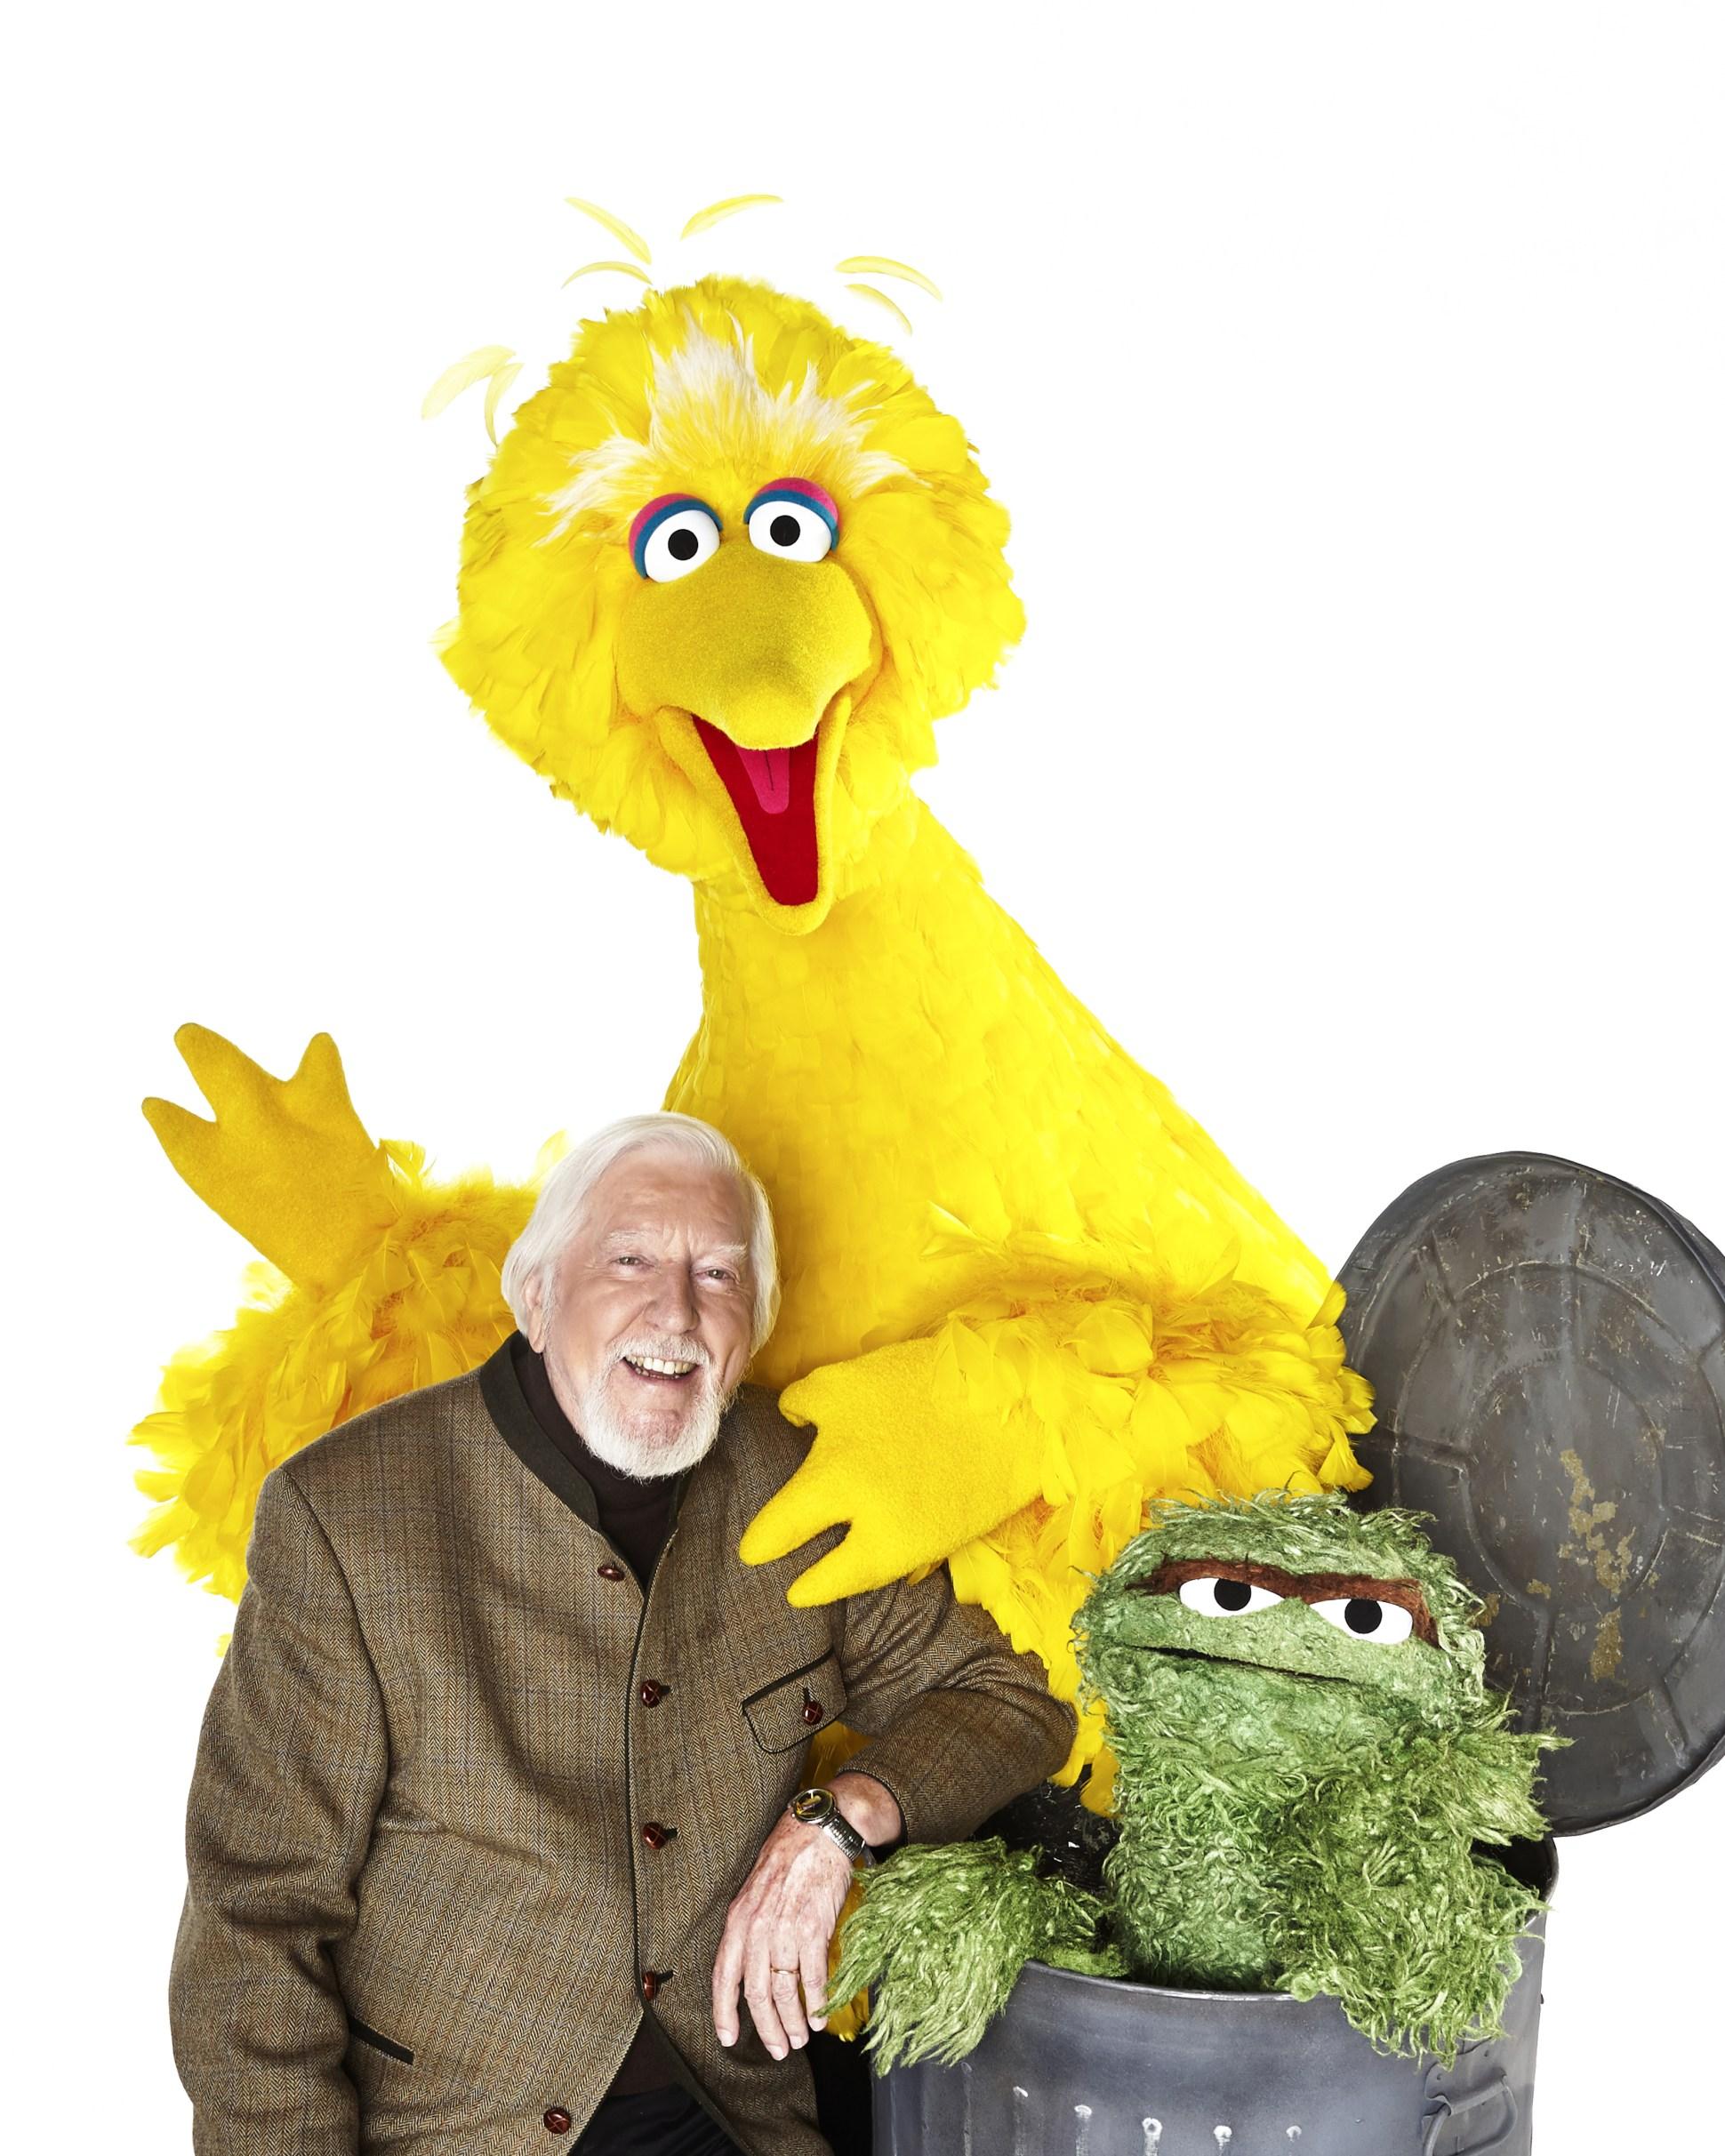 Caroll-Spinney-Big-Bird-Oscar-1